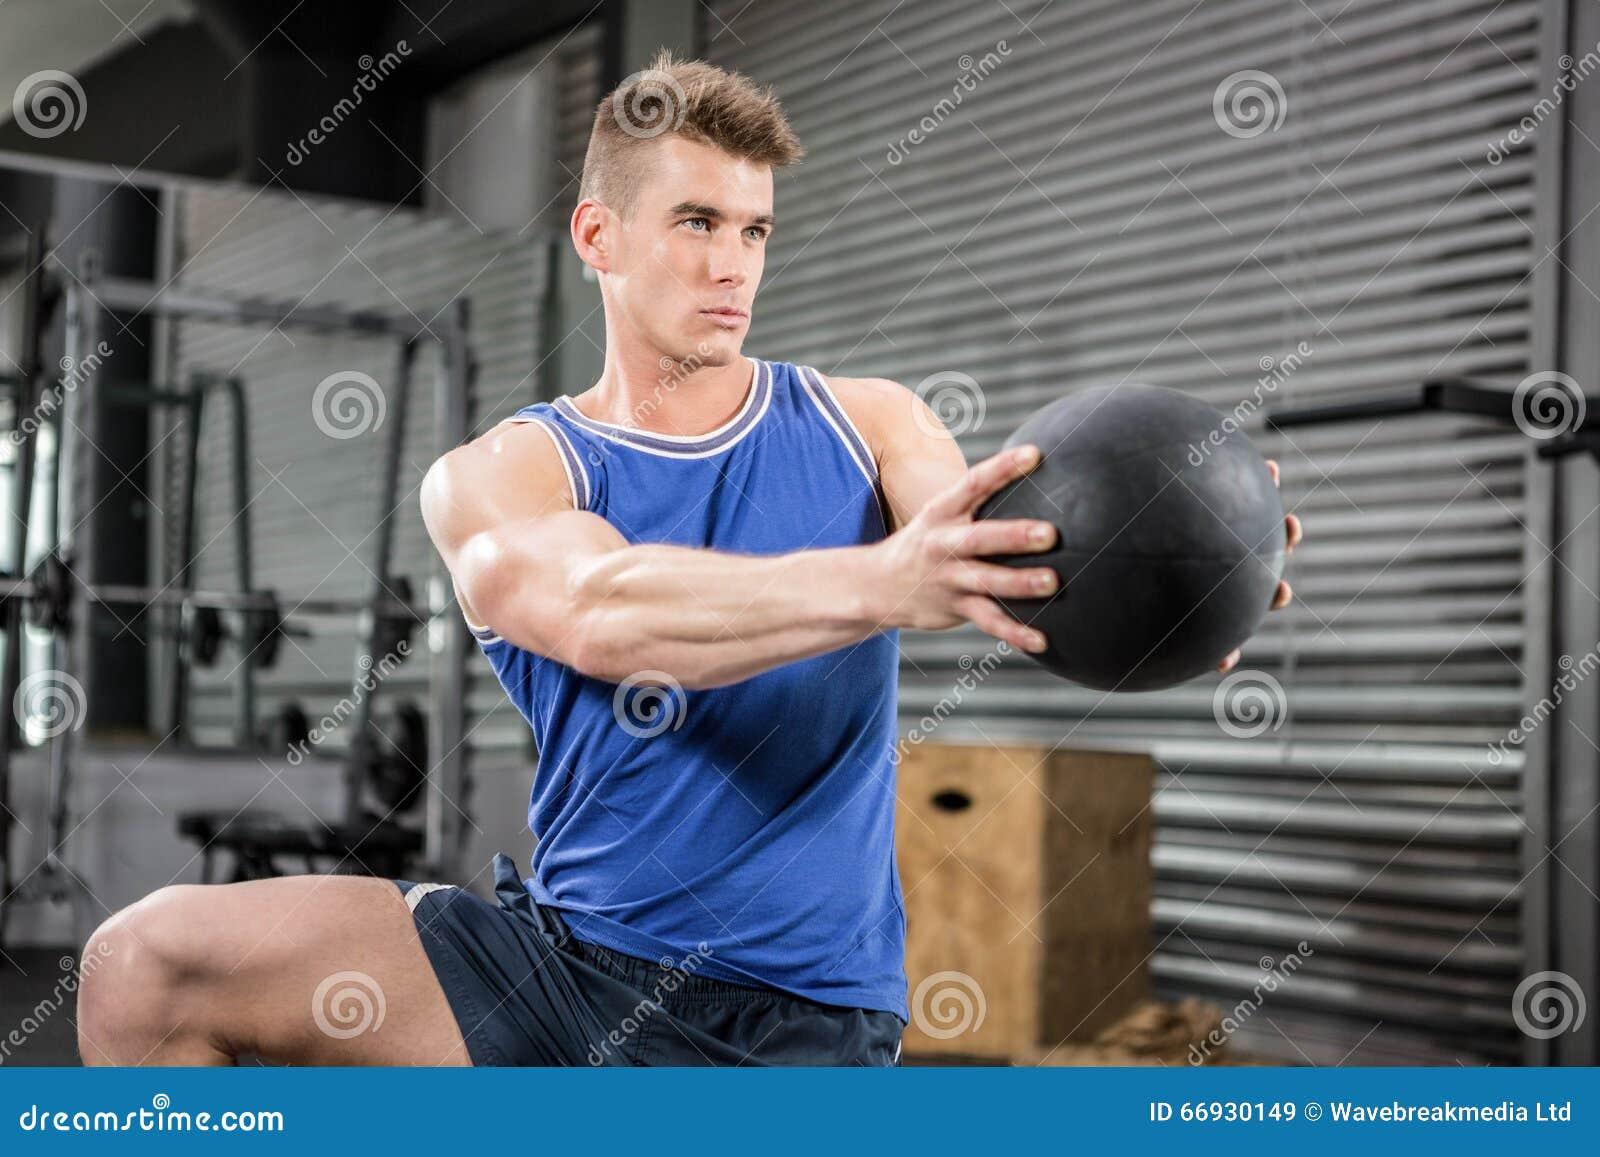 Muscular man training with medicine ball